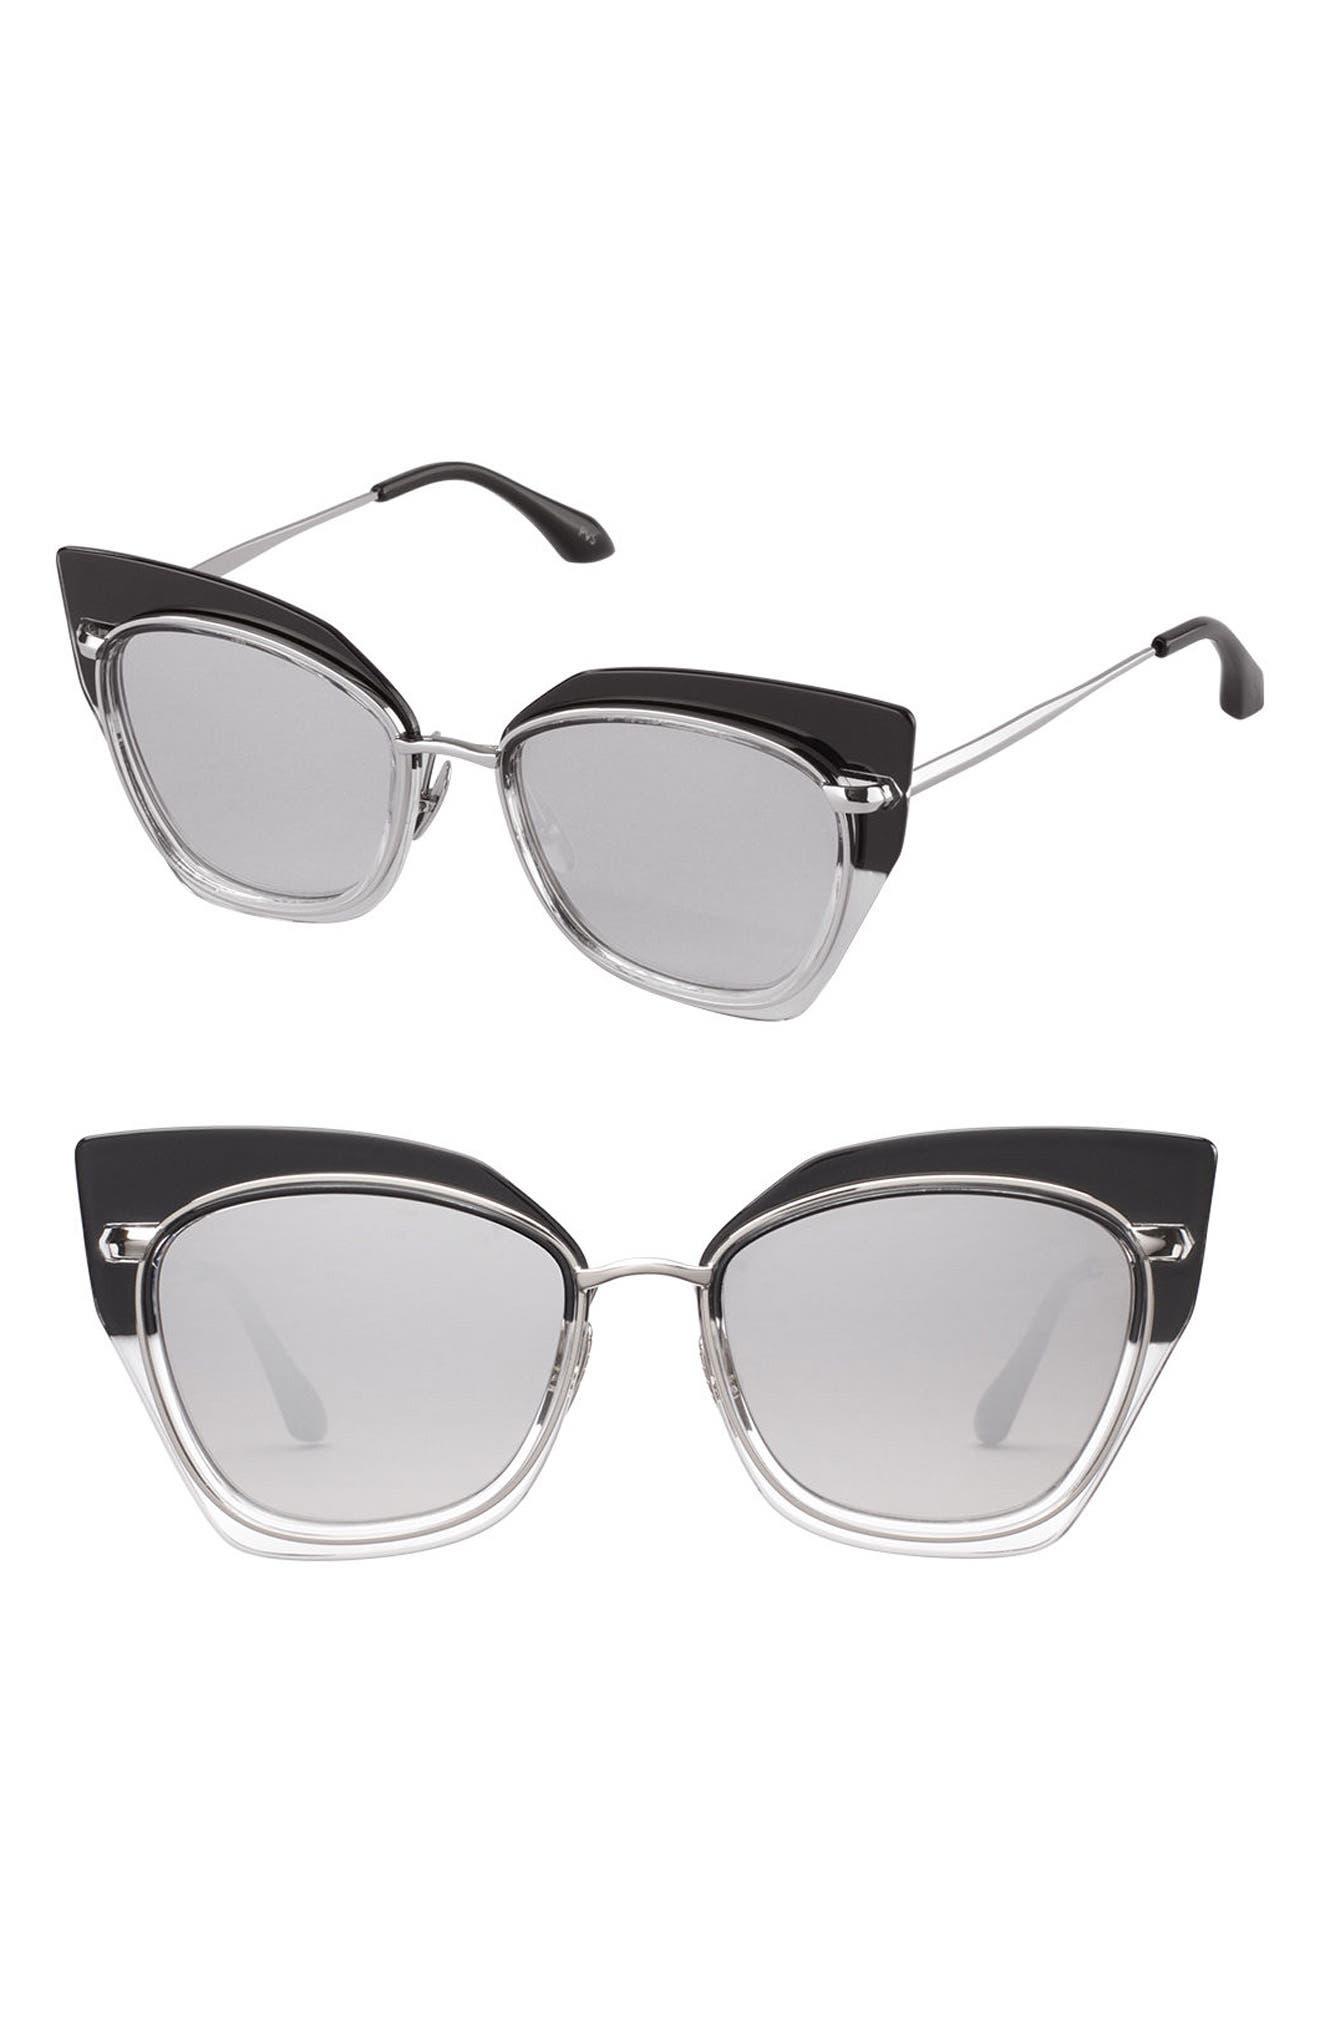 PERVERSE Nordic Cat Eye Sunglasses